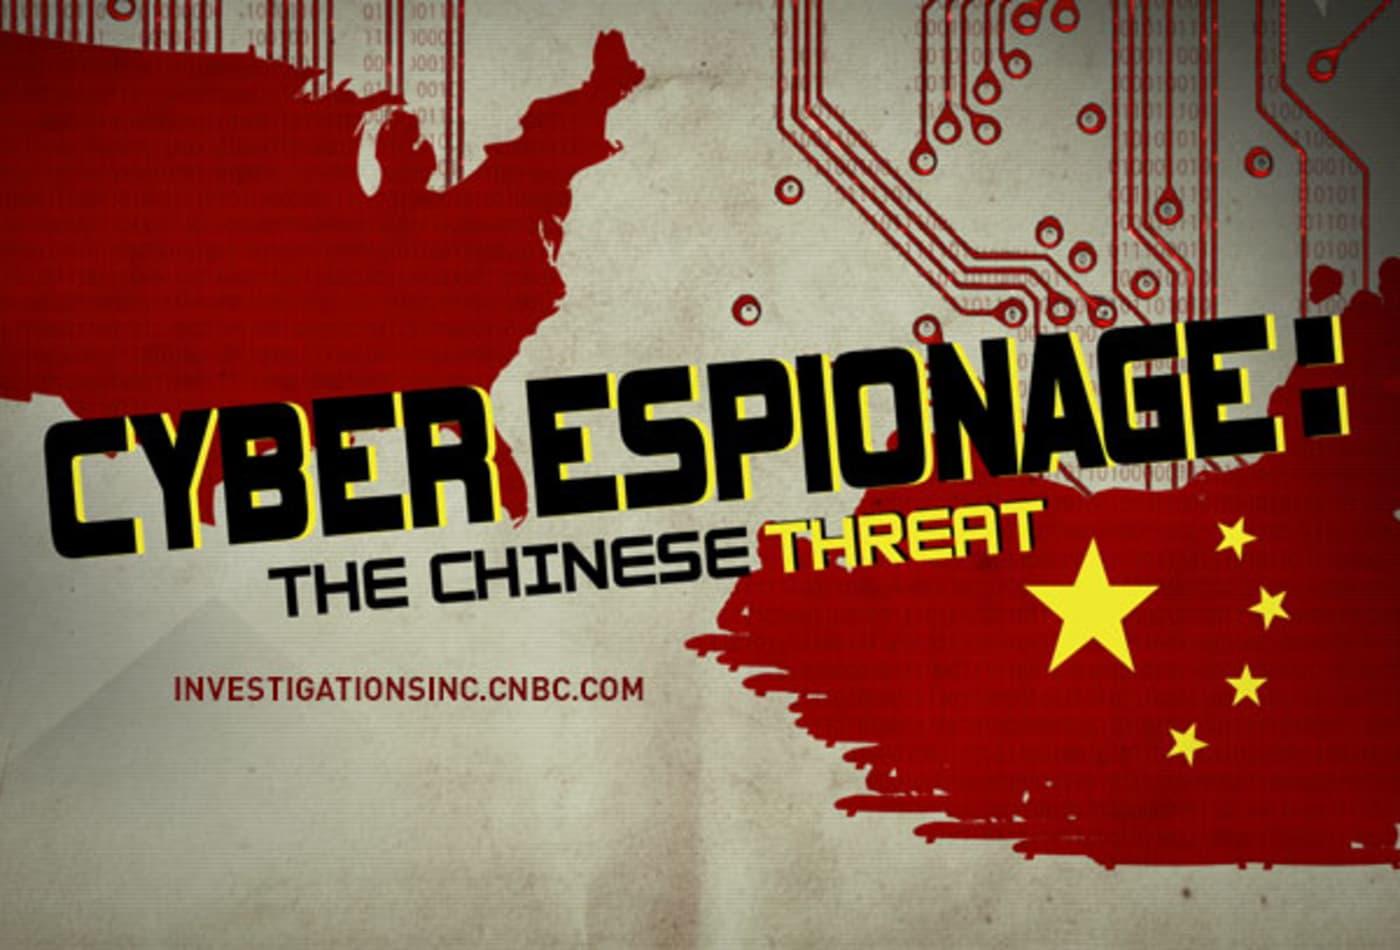 Cyber-Espionage_endslide.jpg